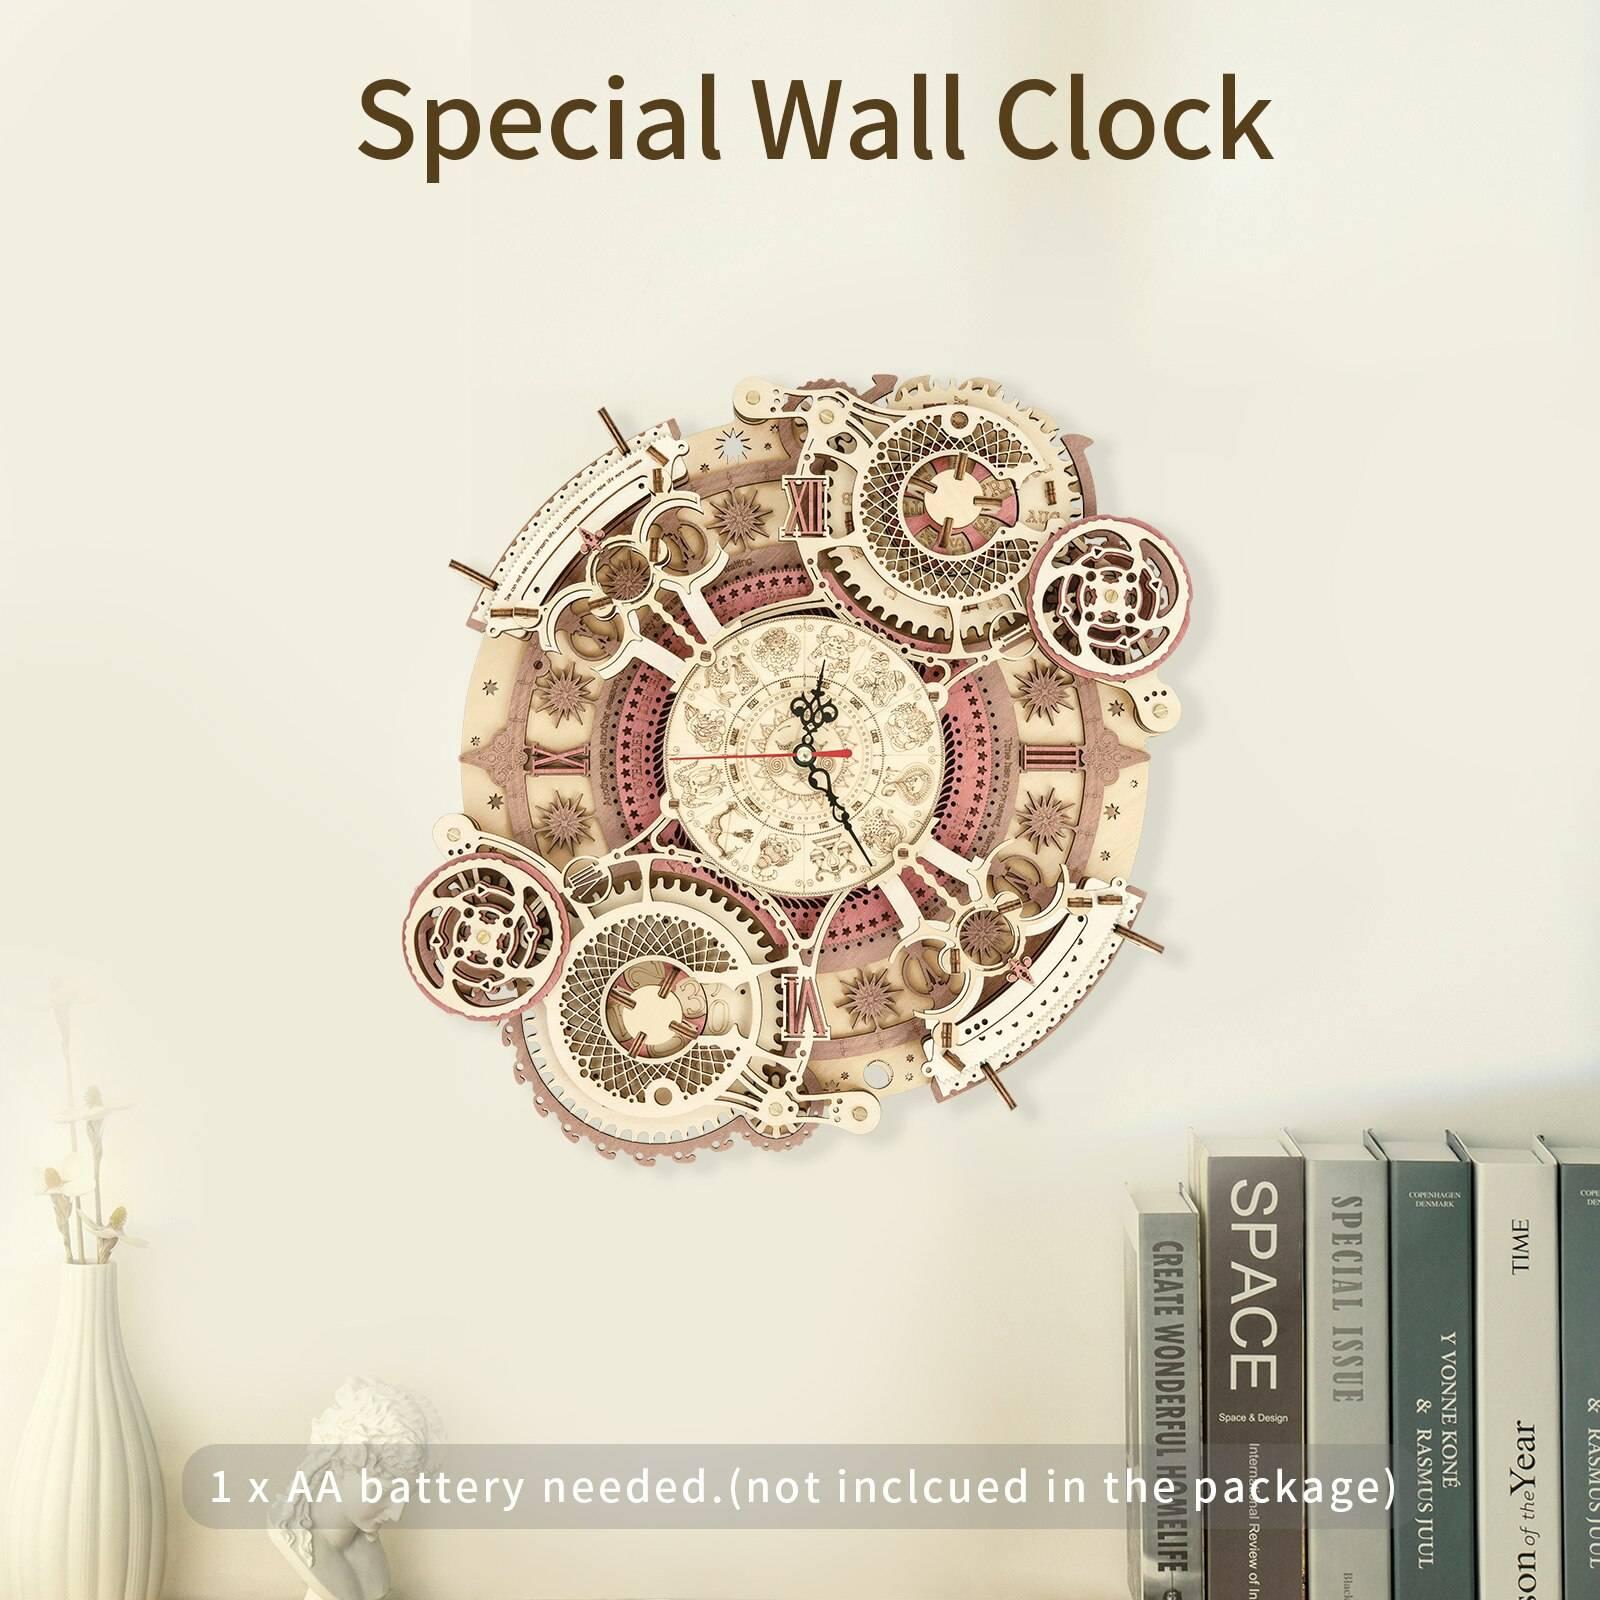 Zodiac Wall Clock 3d Wooden Puzzle Kit Toys